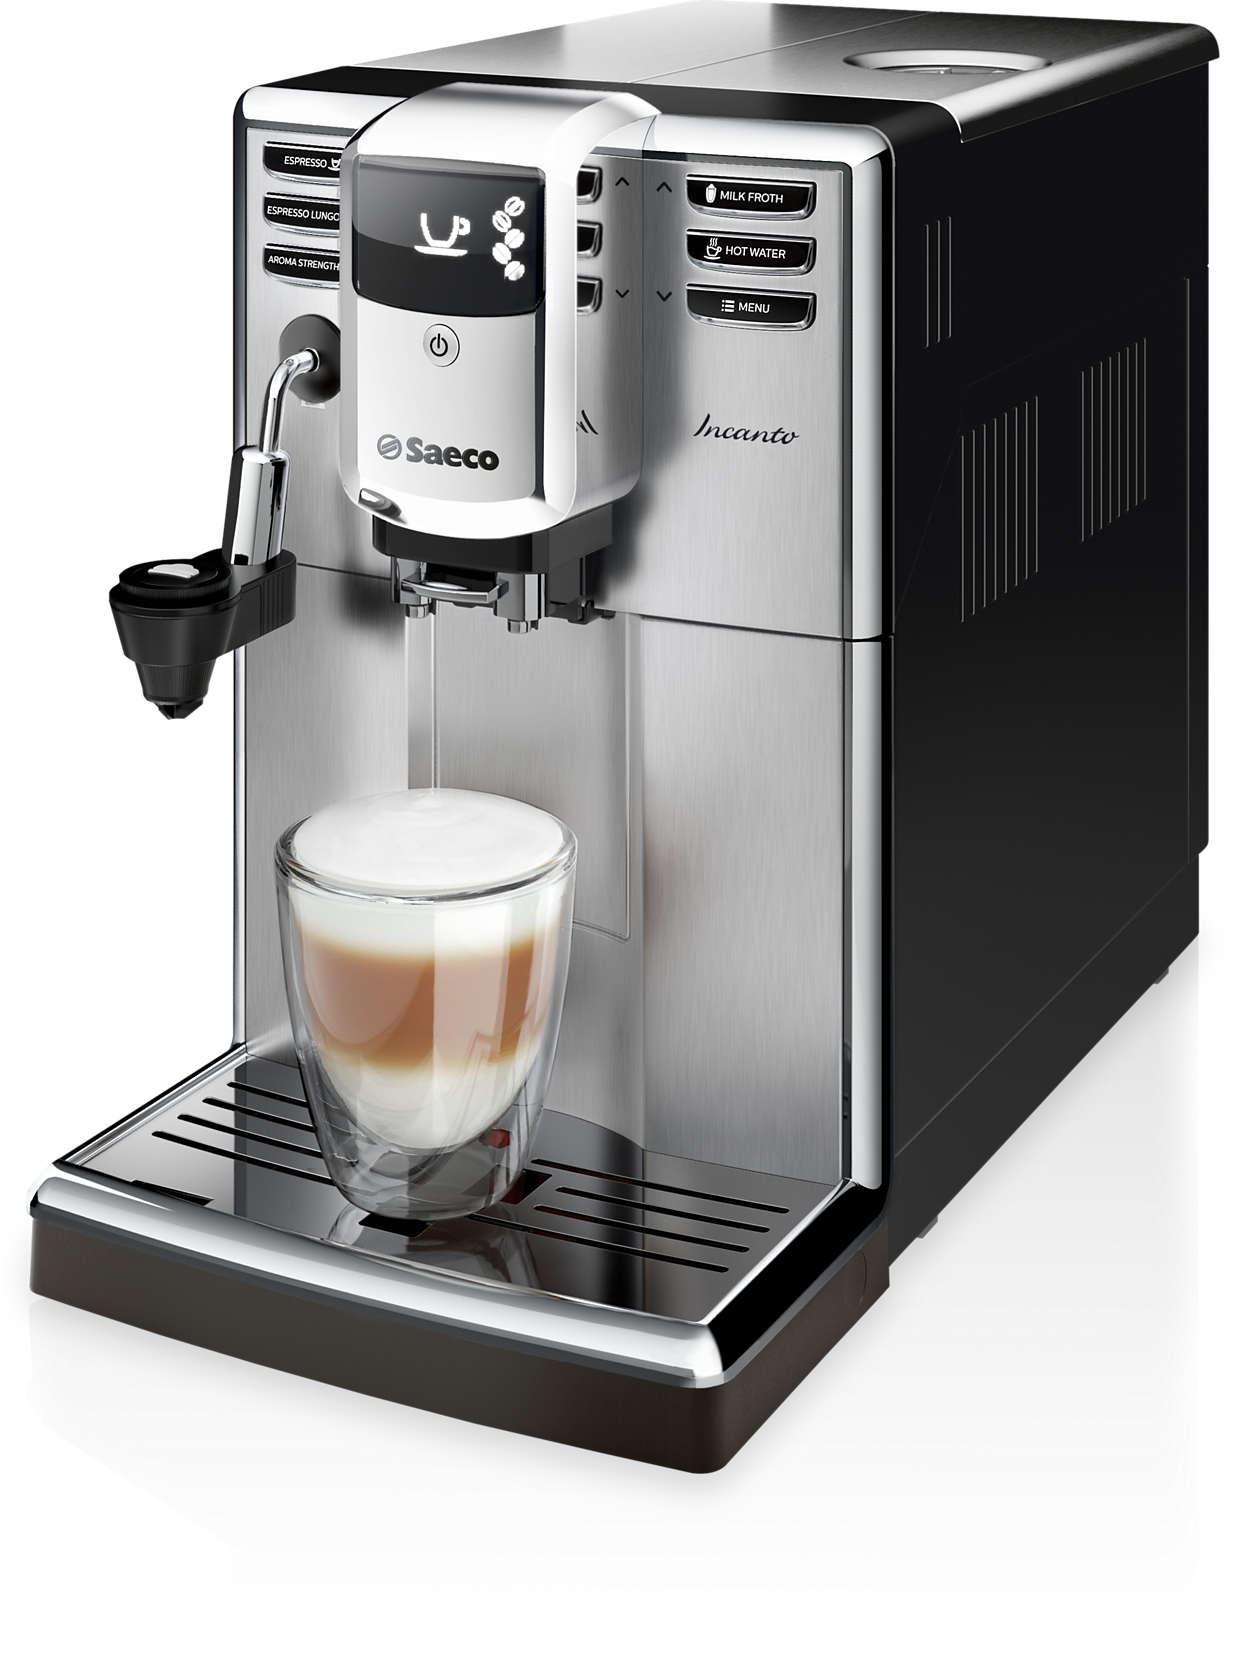 Elegantan dizajn. Kava impresivne kvalitete.